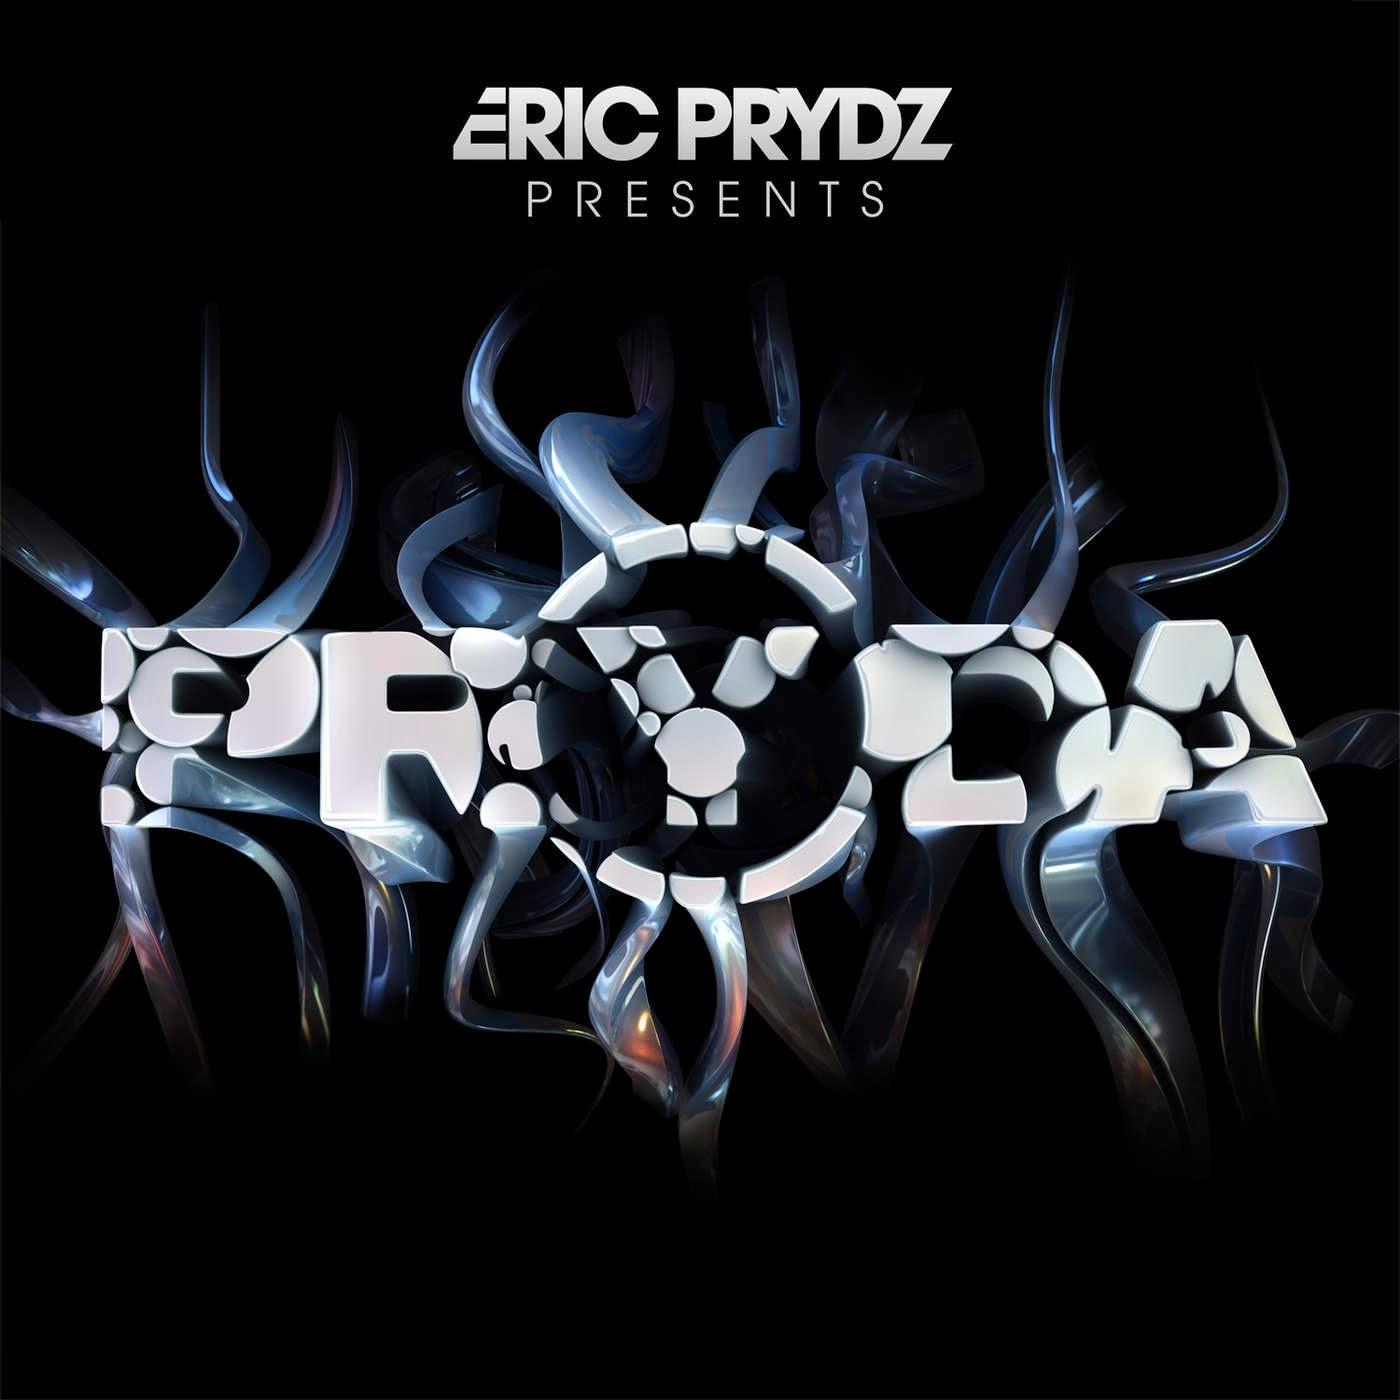 Eric Prydz - Eric Prydz Presents Pryda (Deluxe Version) Cover